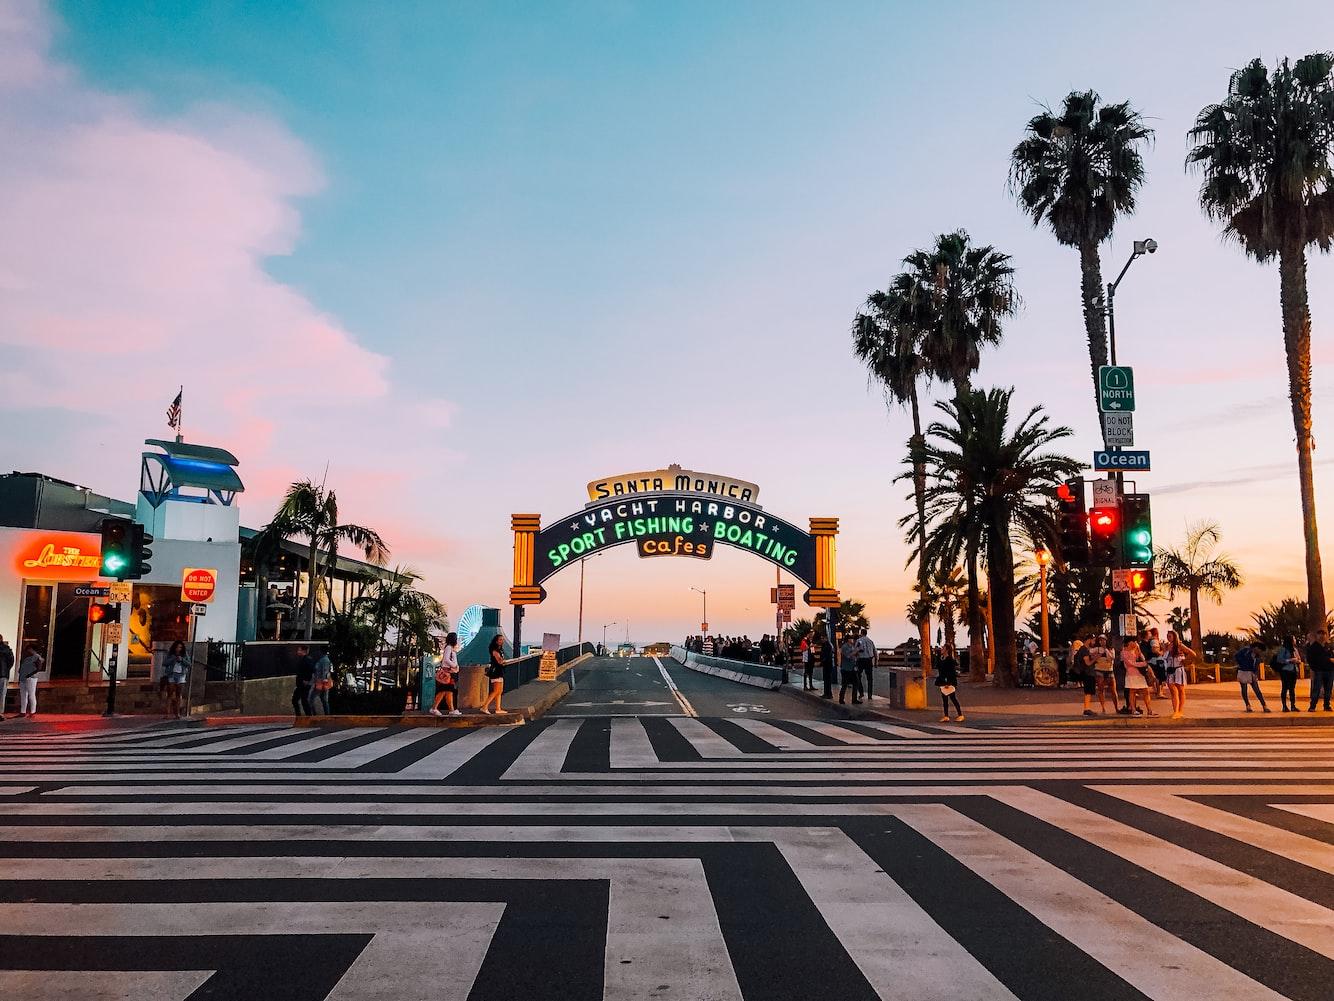 Top 40+ Tech Companies In Santa Monica In 2021